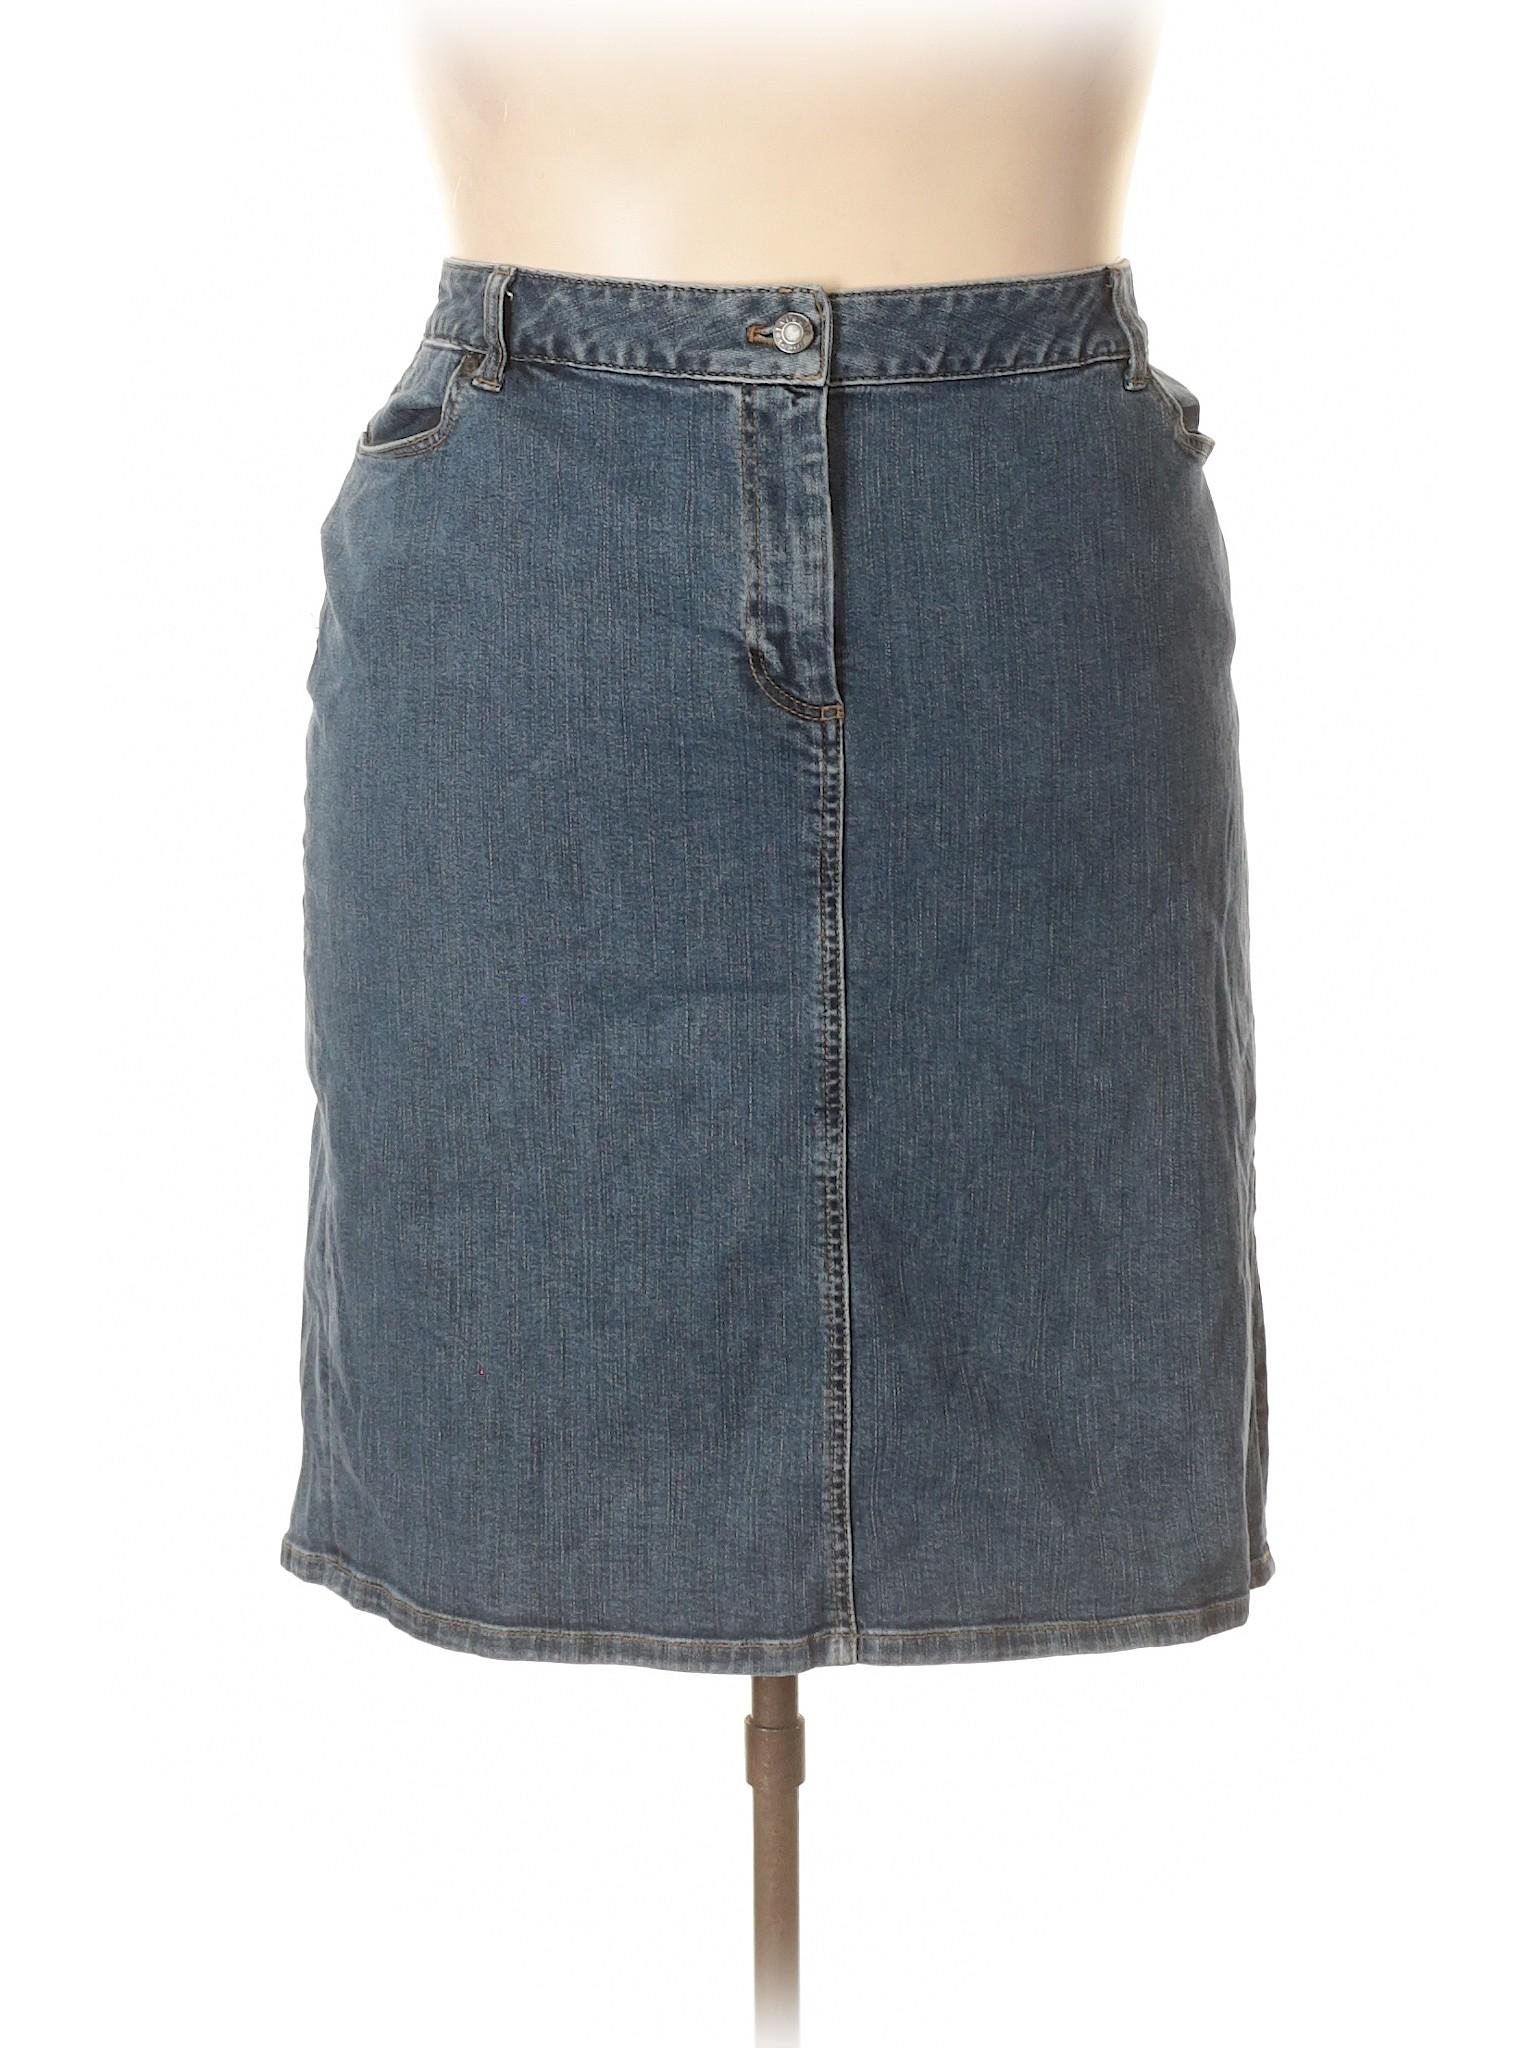 Denim Skirt Denim Boutique Boutique Skirt Denim Skirt Boutique OWYHq